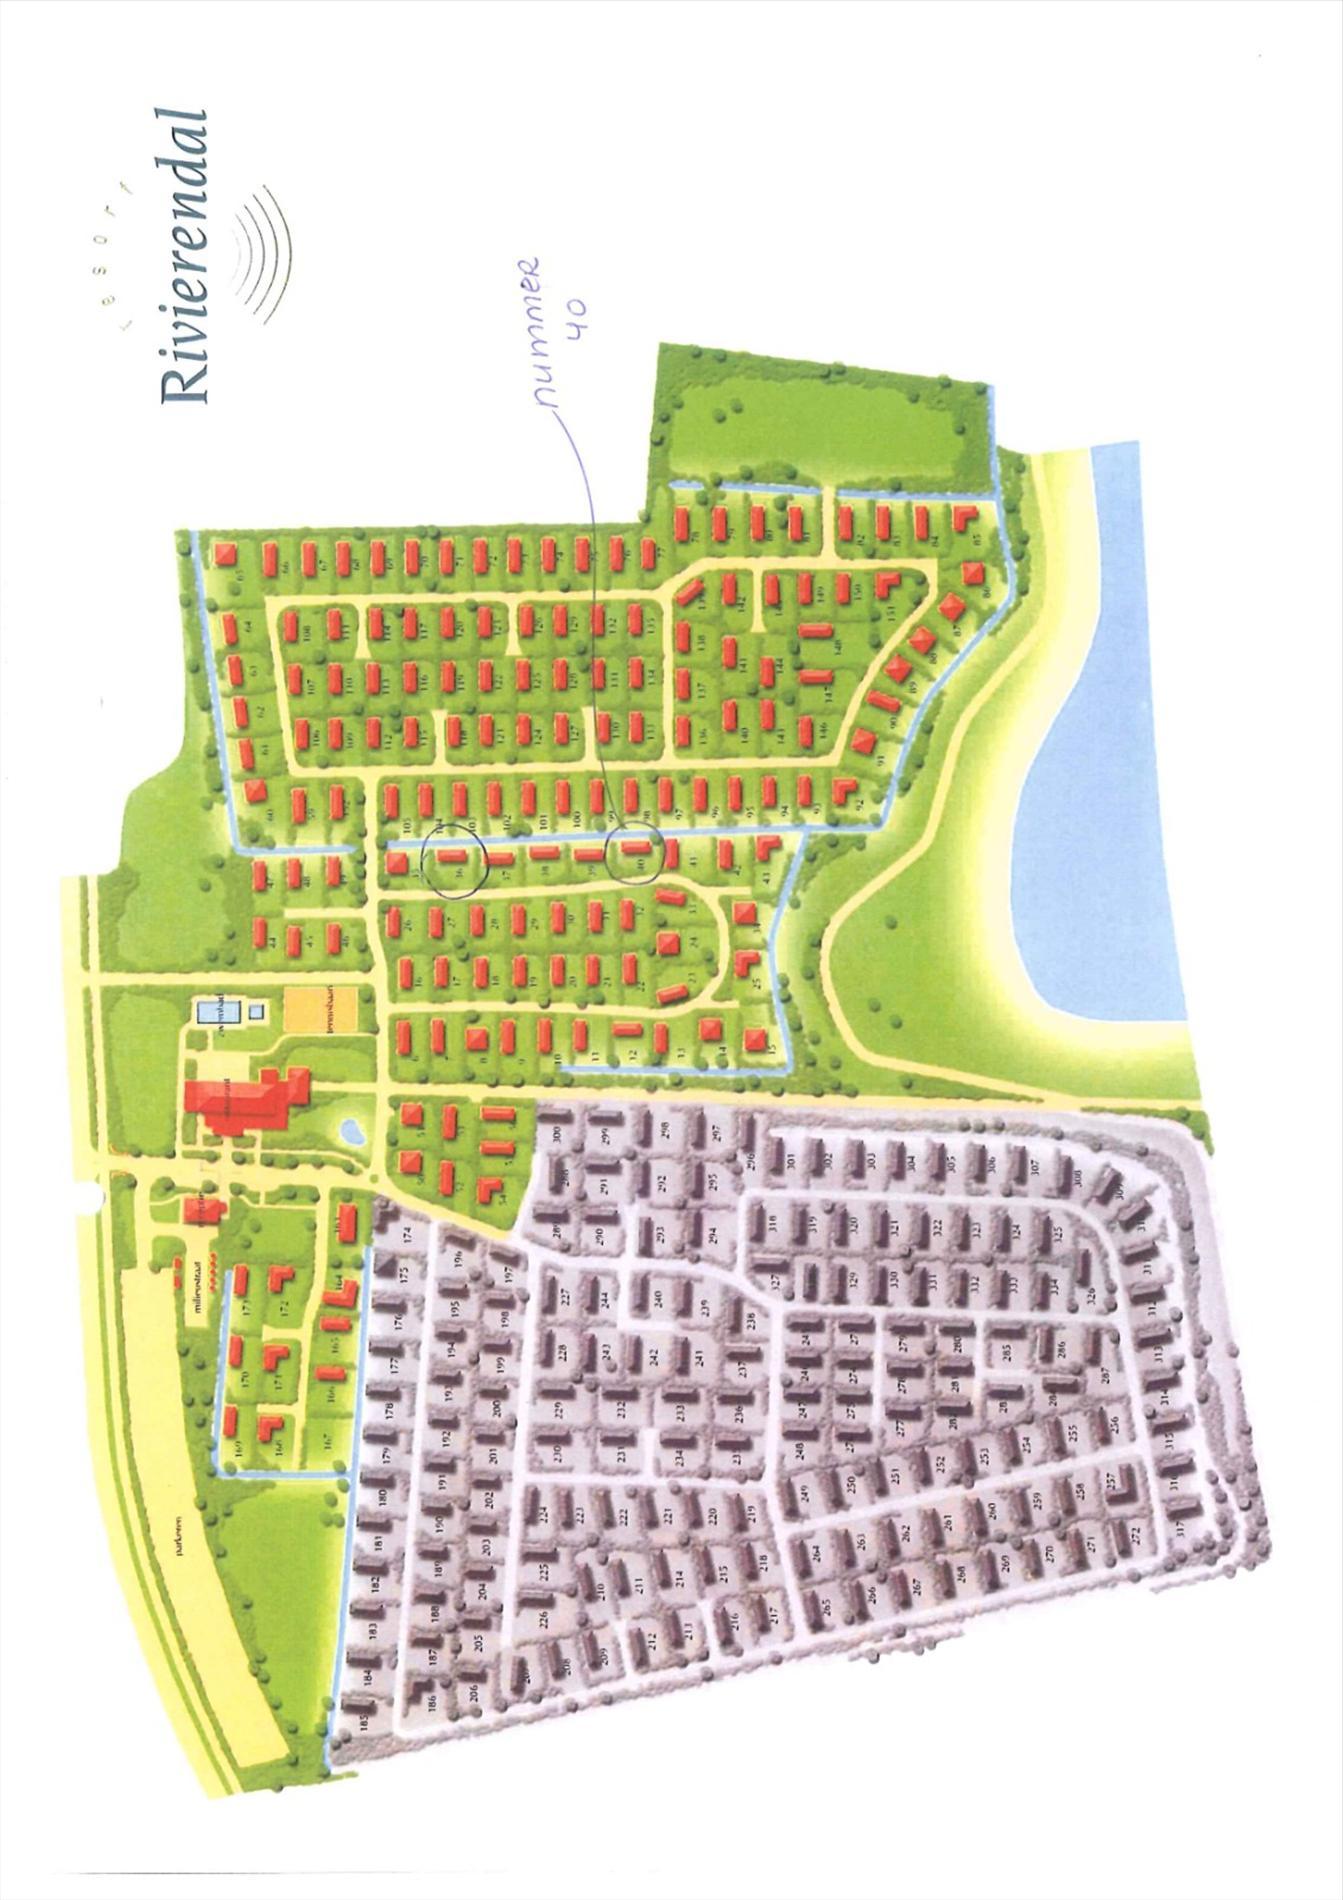 Floorplan - Bonegraafseweg 32-040, 4051 CH Ochten